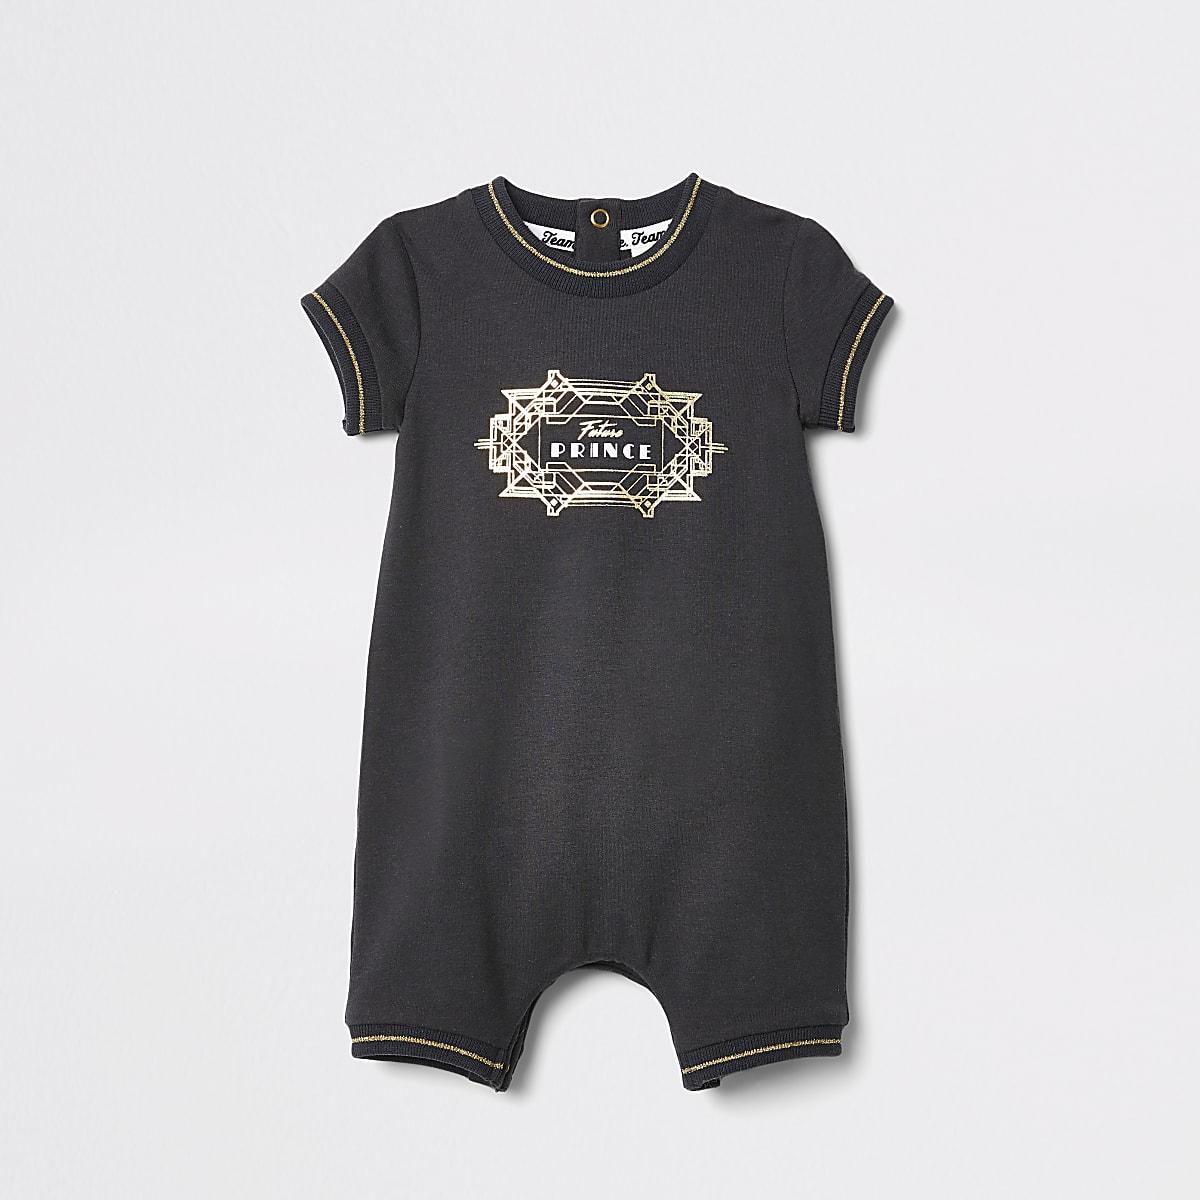 Baby black 'Little prince' twinning romper